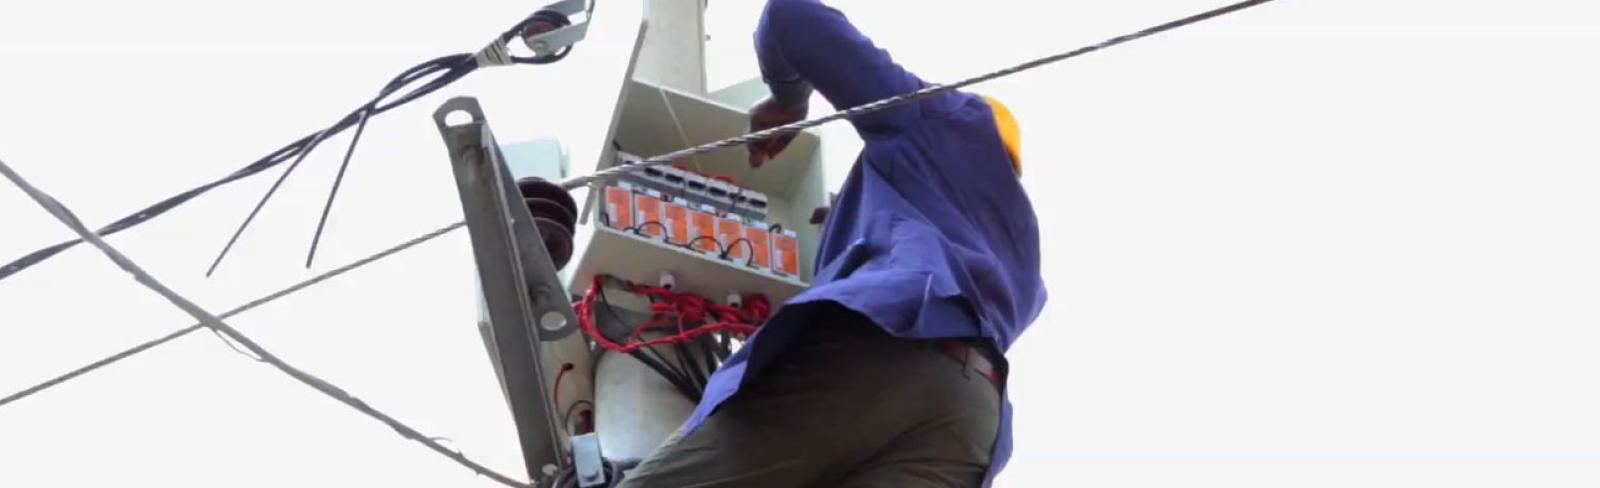 Bringing Global Best Practices to Transform Kenya's Slum Electrification Program